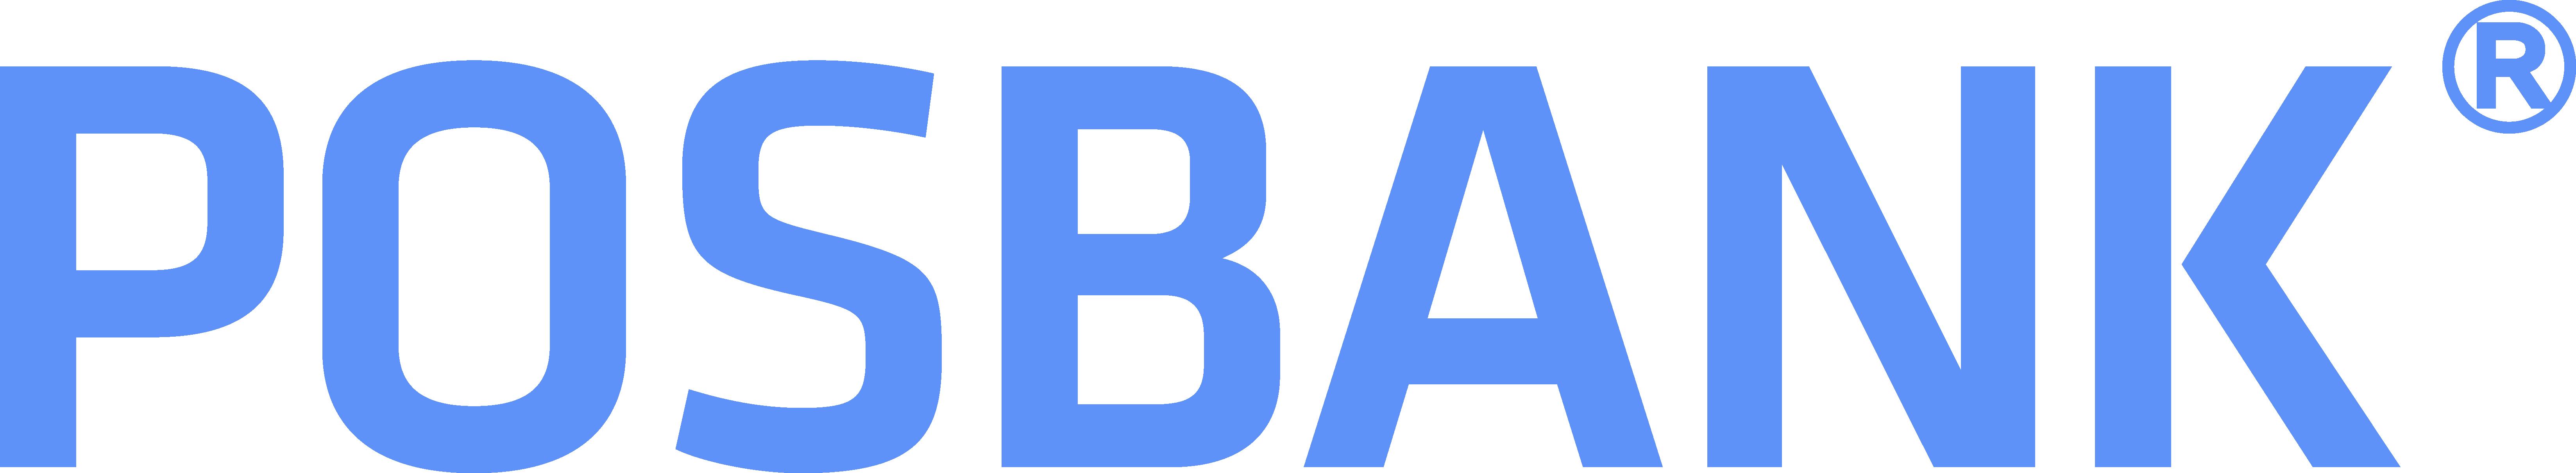 POSBANK logo